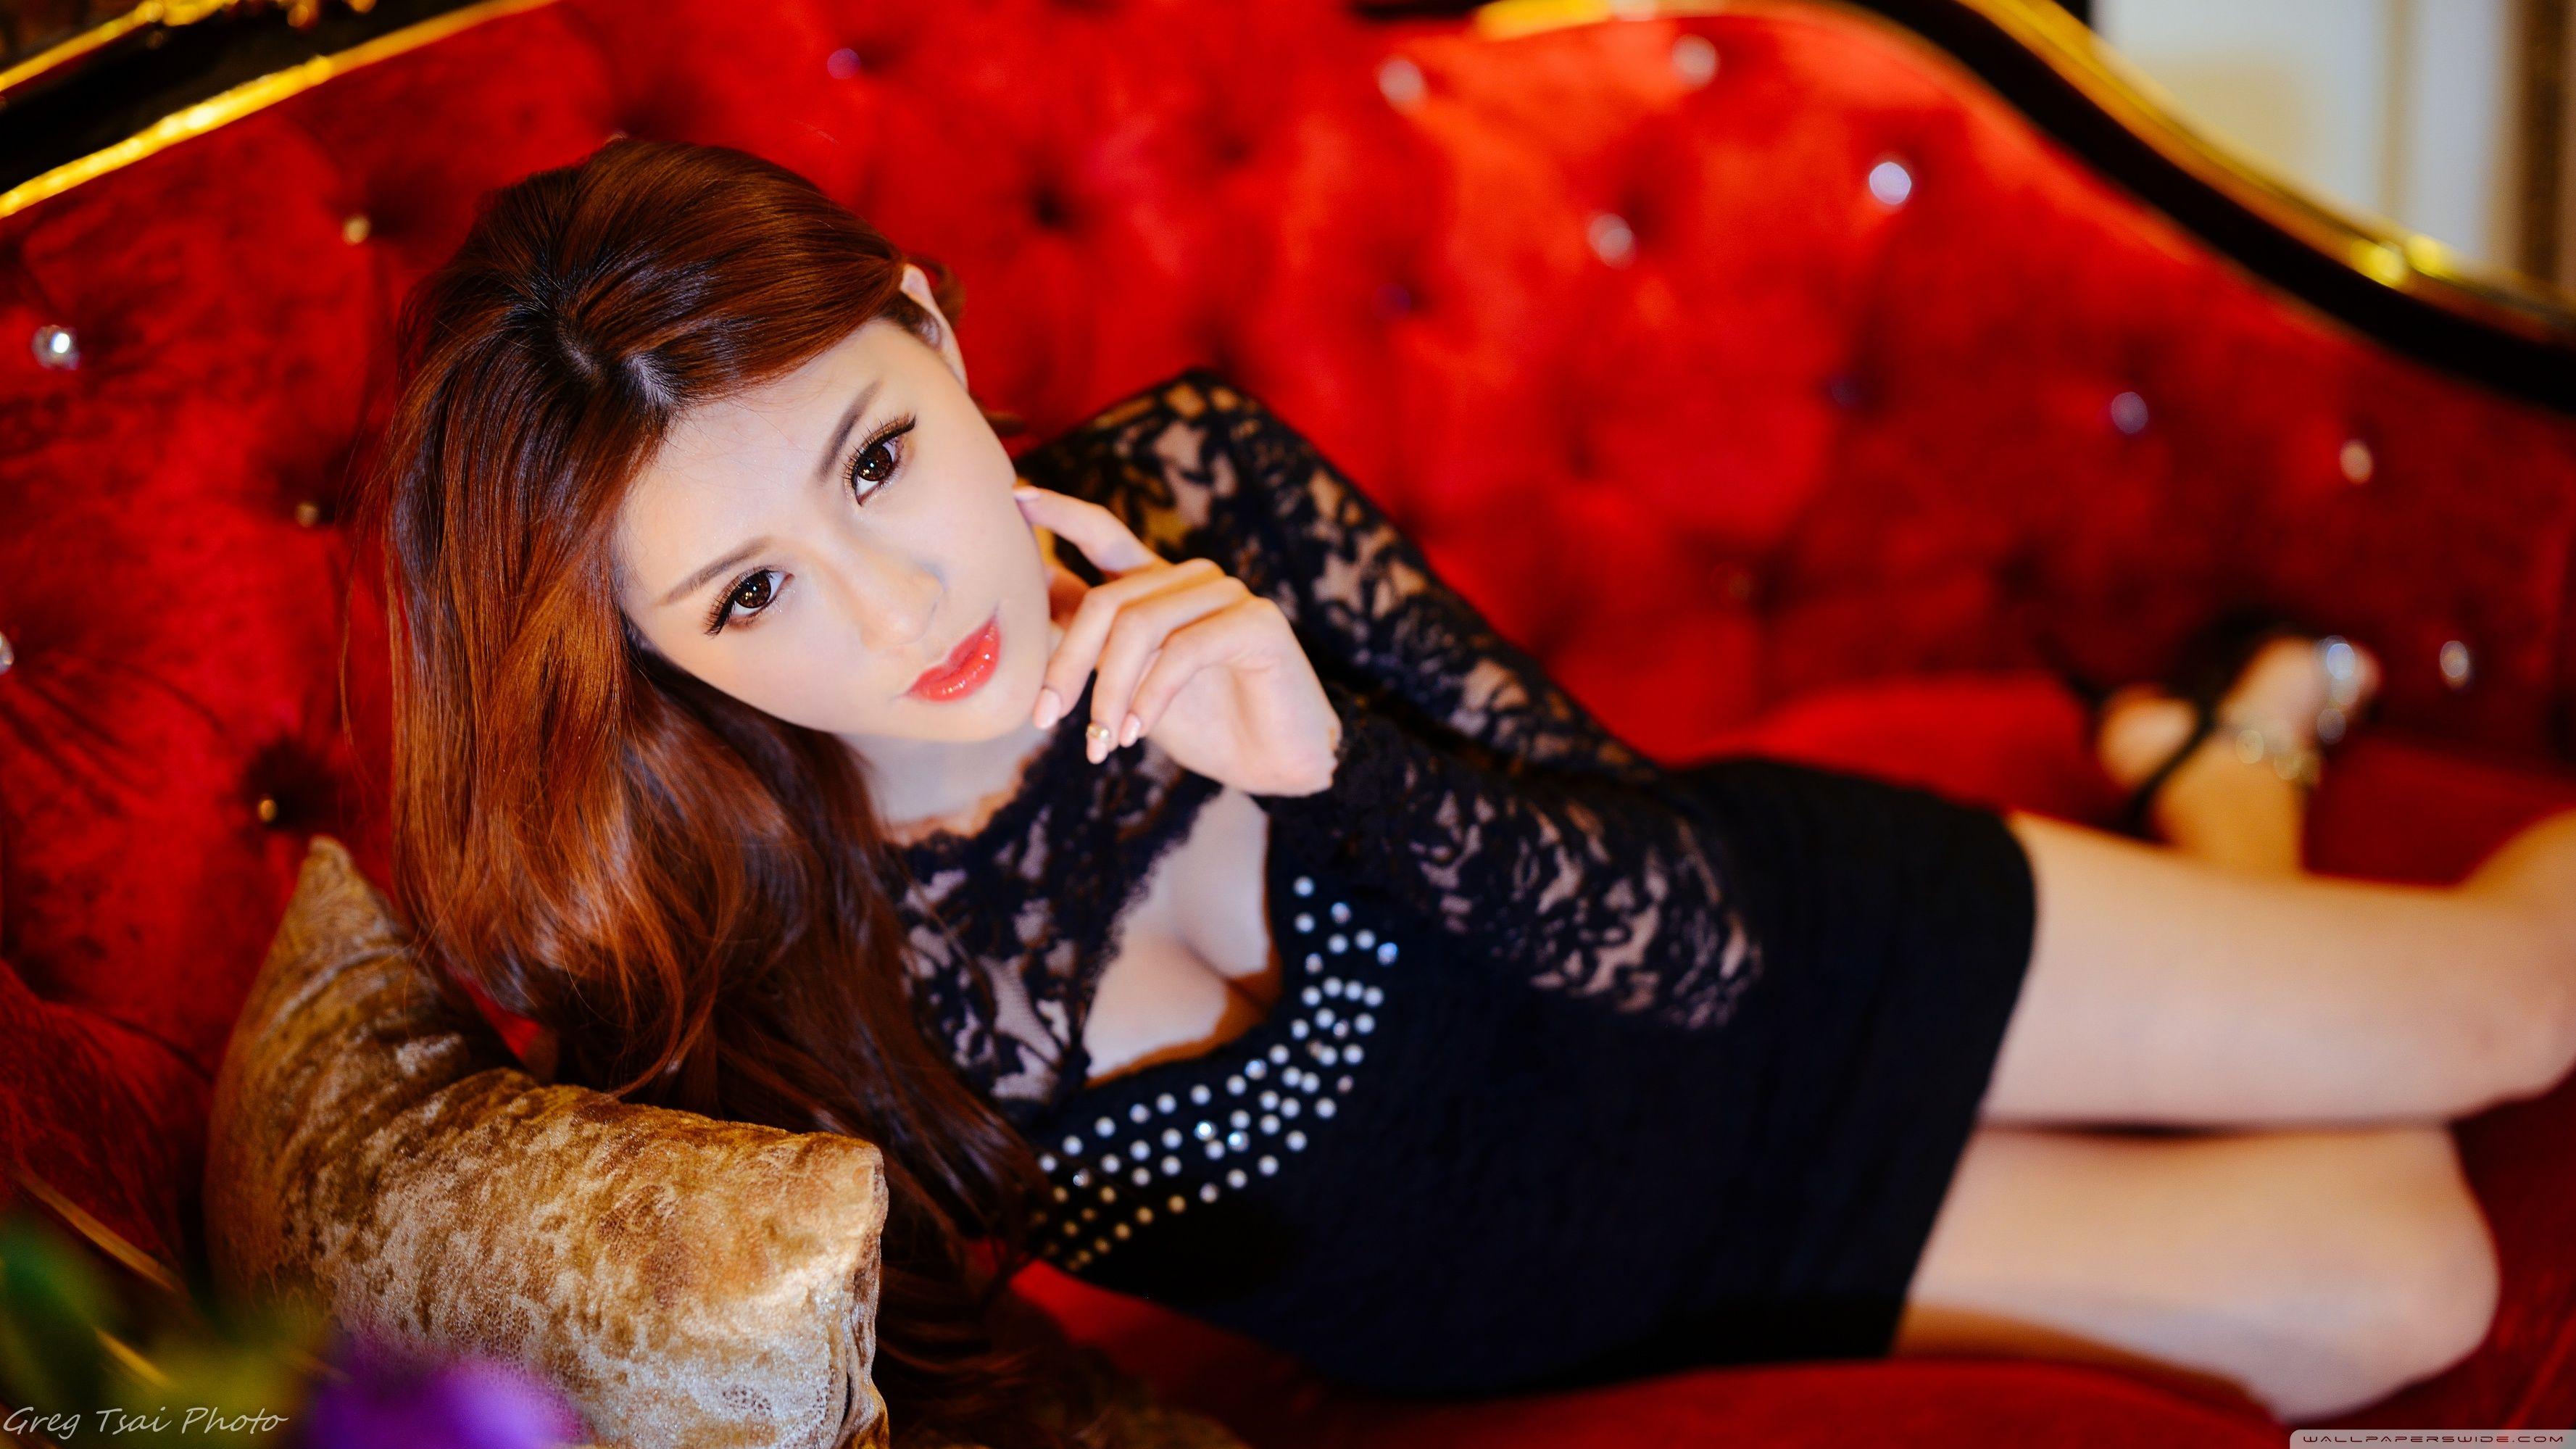 Asian Girl Wallpaper 4k , HD Wallpaper & Backgrounds